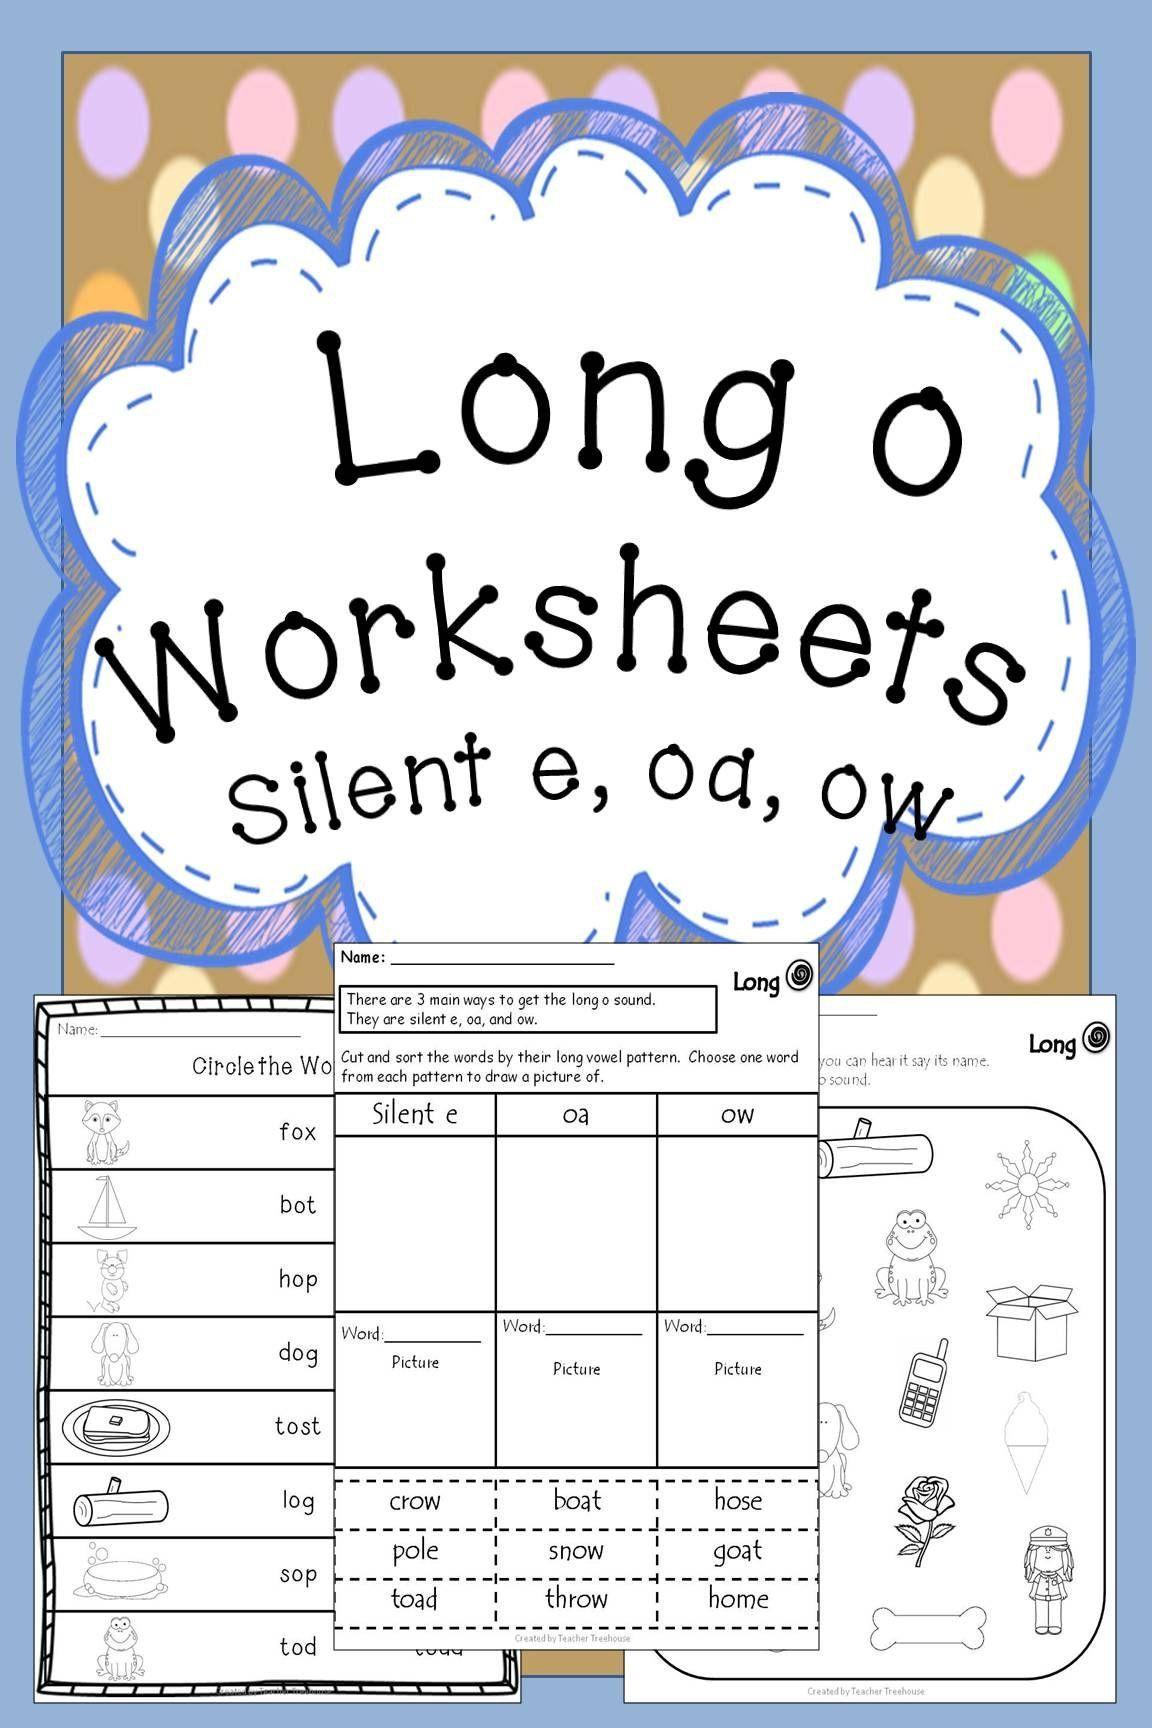 Oa Ow Worksheets 2nd Grade Long O Worksheets Long O Oa Silent E Ow Vowel Teams In 2020 2nd Grade Worksheets Vowel Teams Worksheets Kindergarten Worksheets